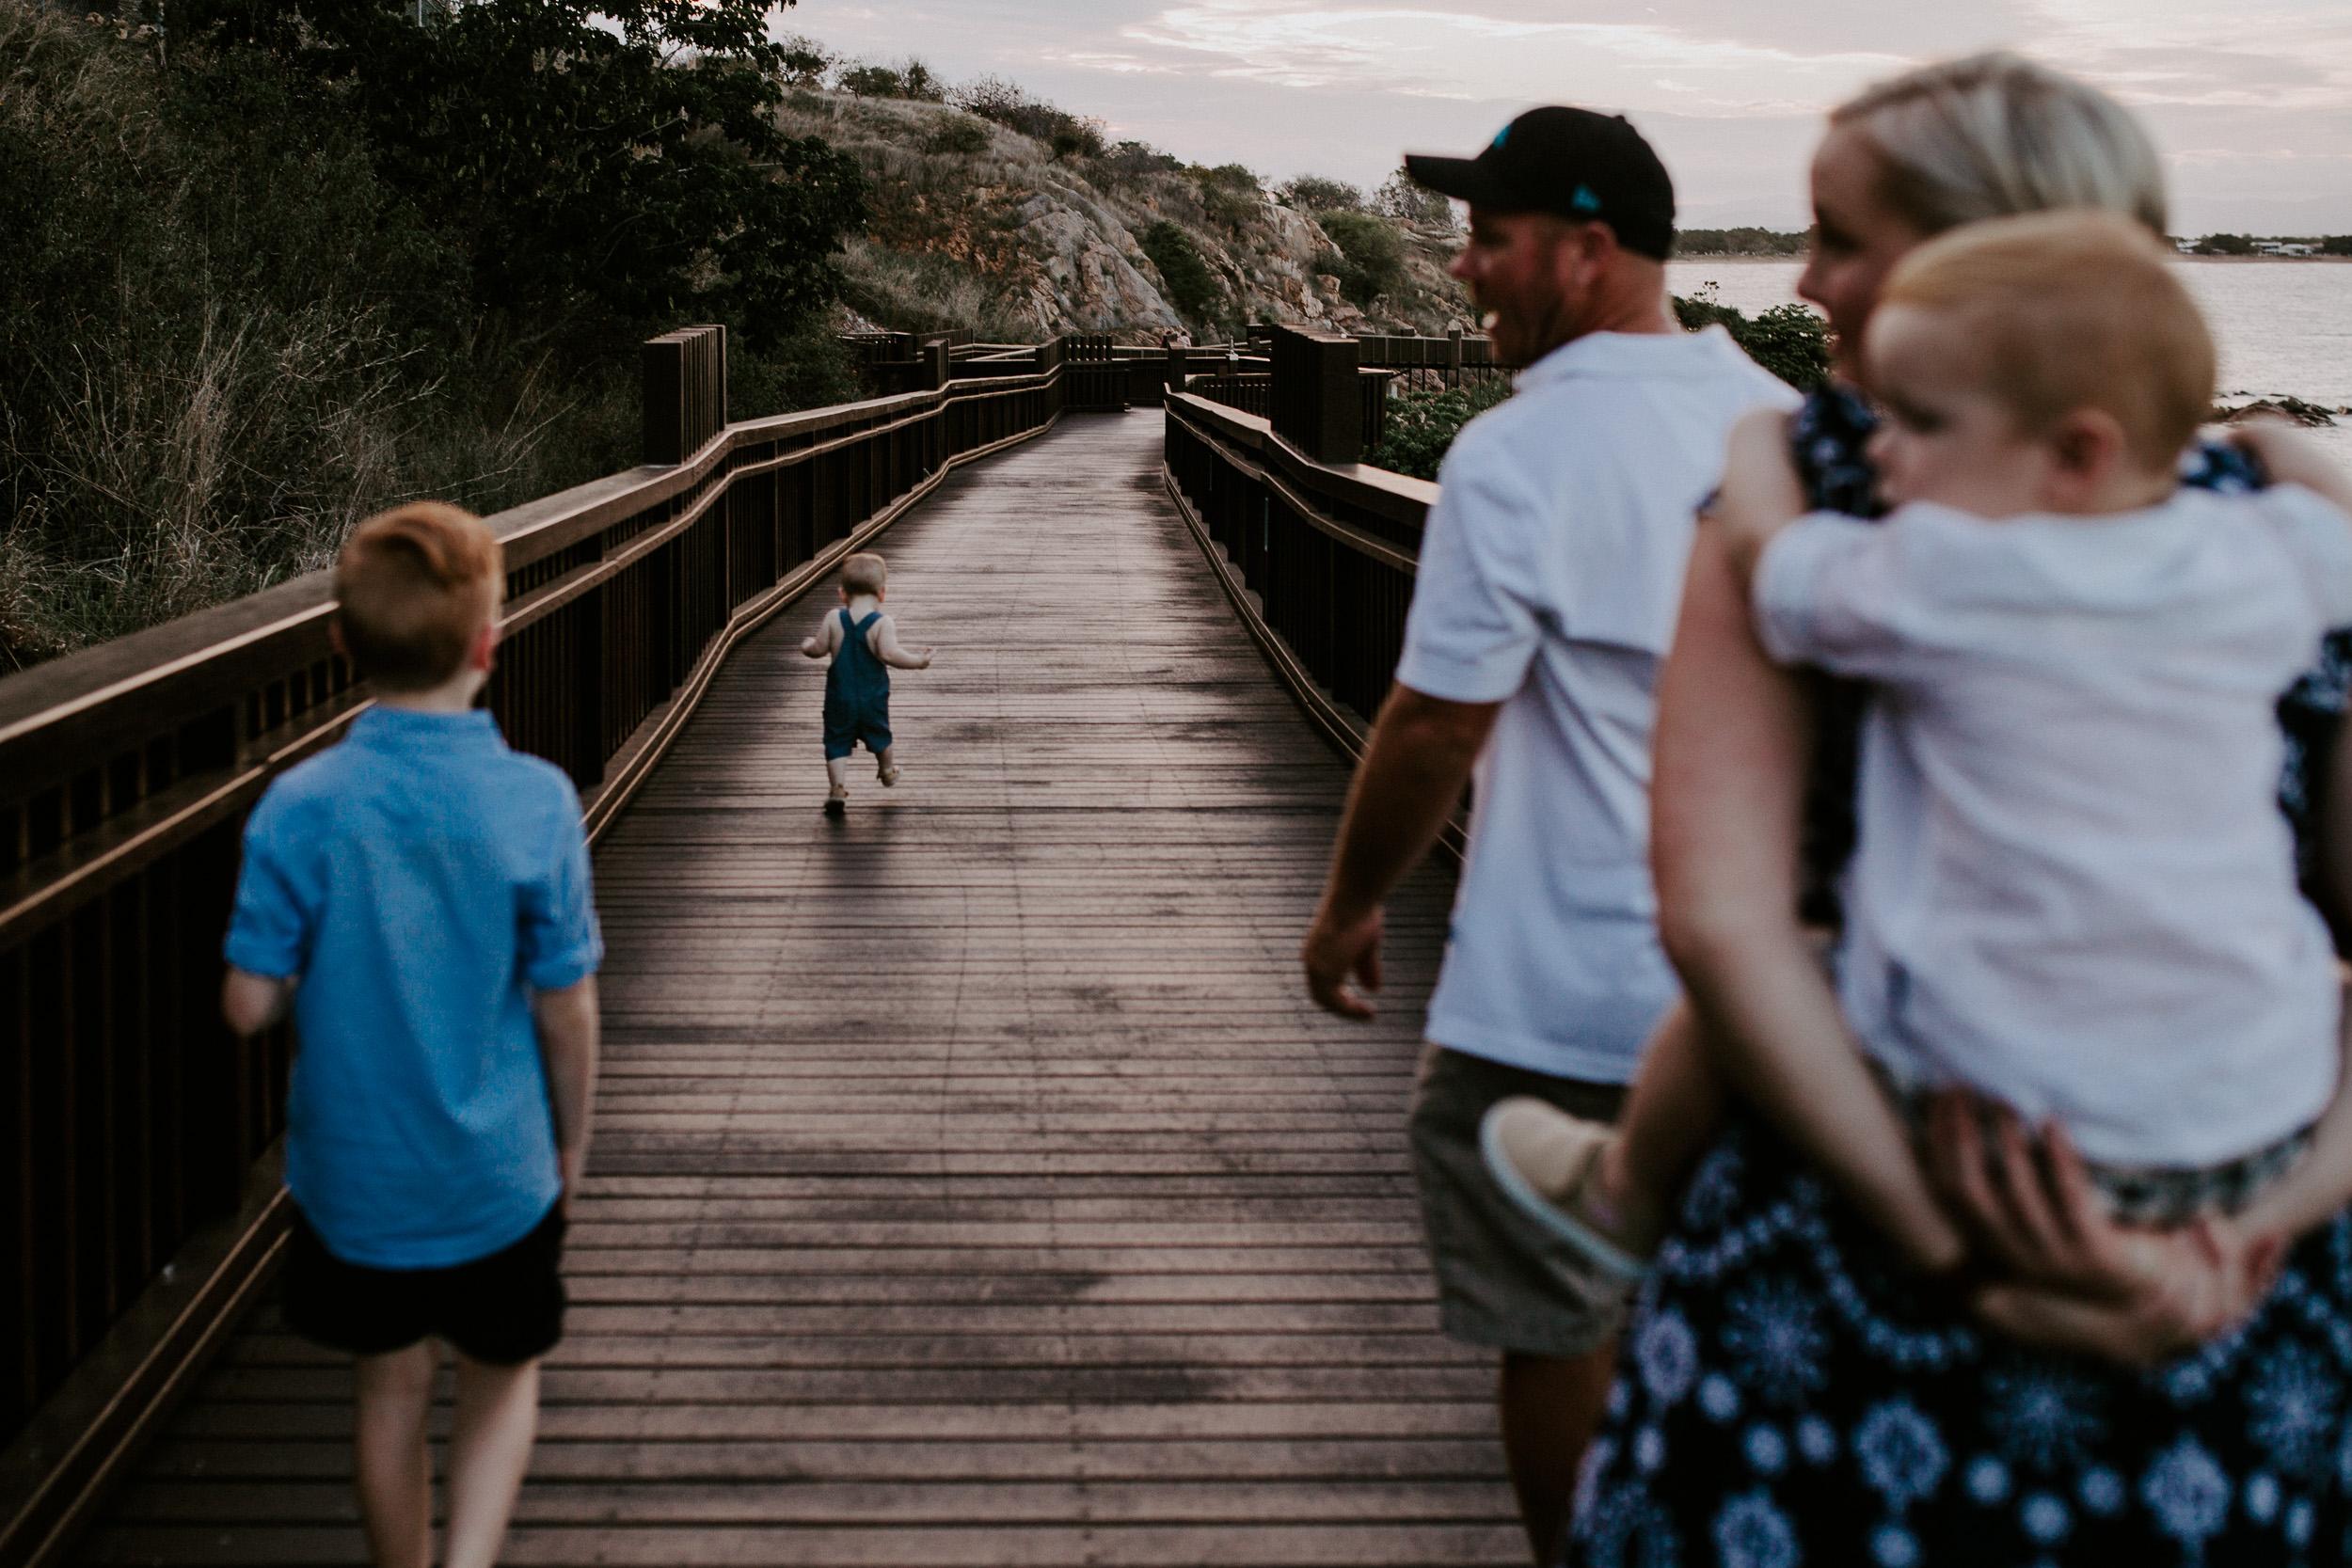 outdoor-family-lifetsyle-townsville-photographer-83.jpg